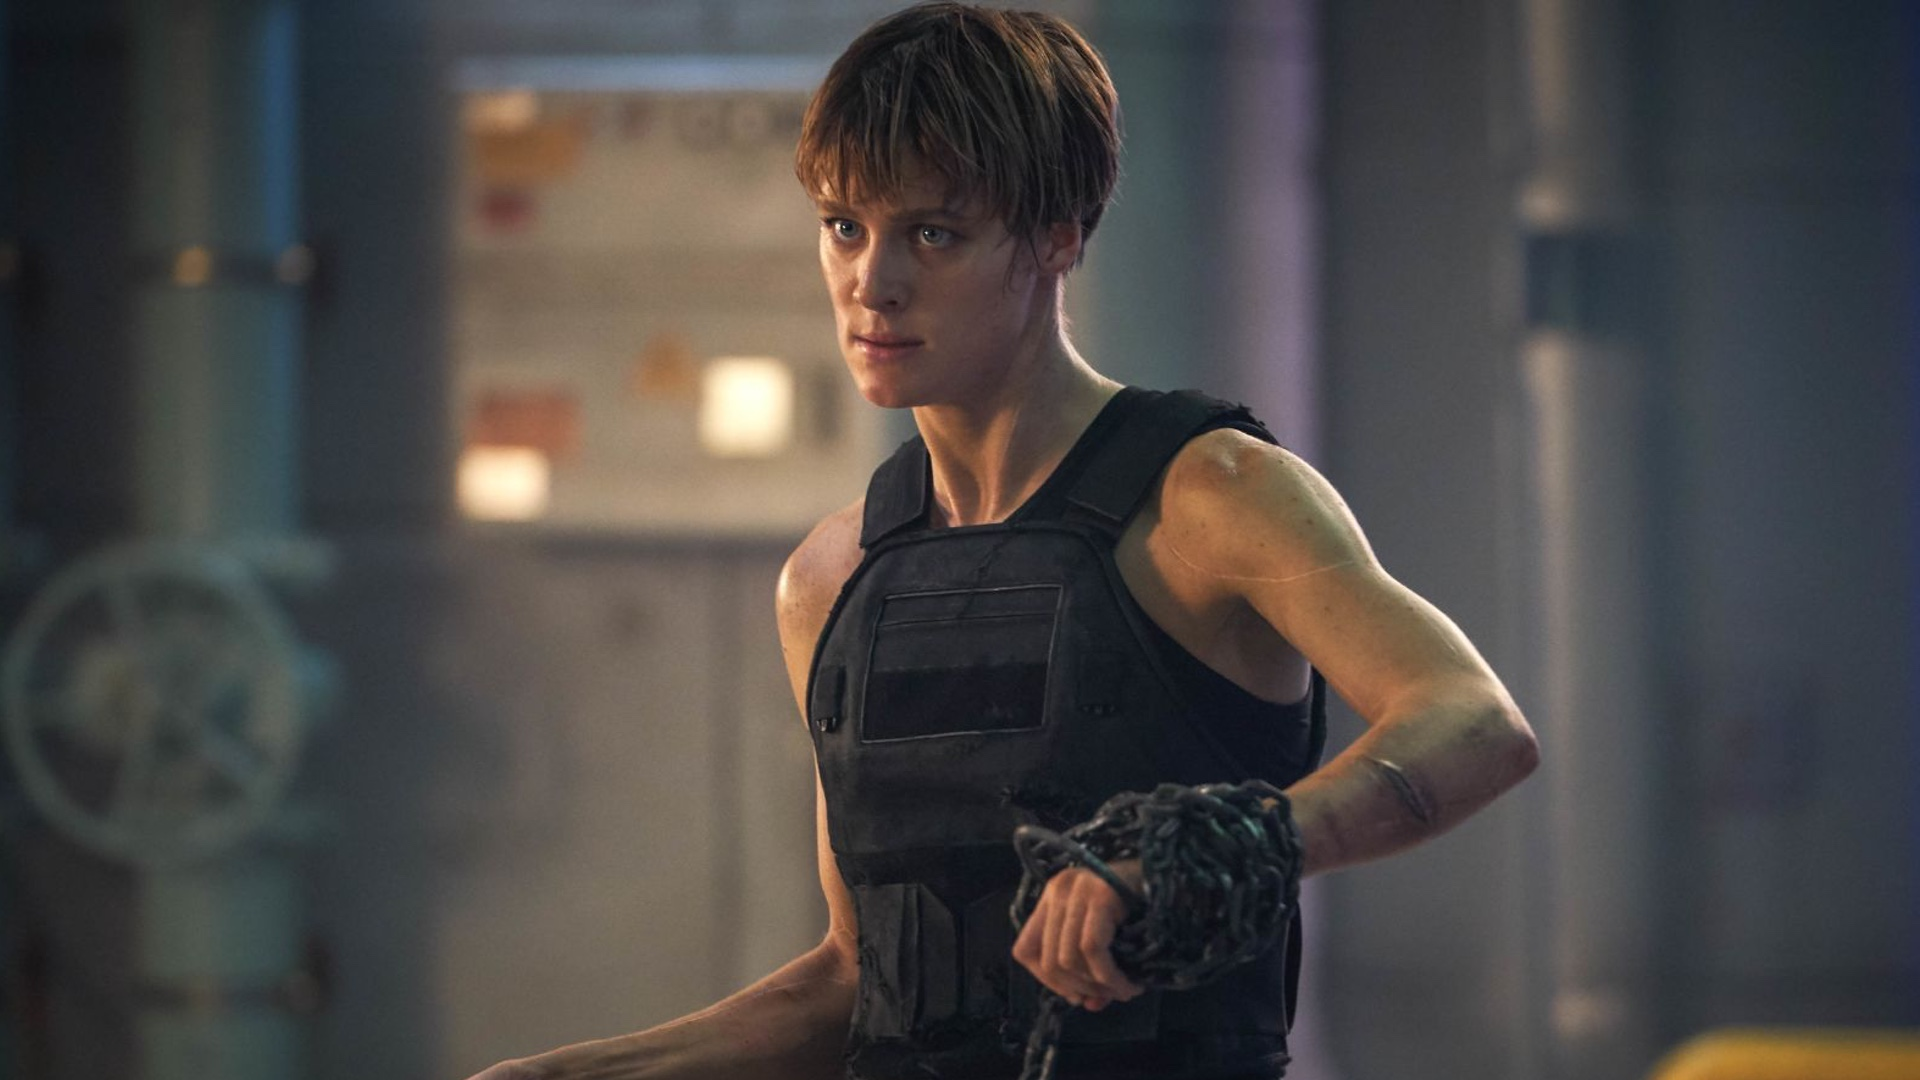 Expectations for Terminator Dark Fate